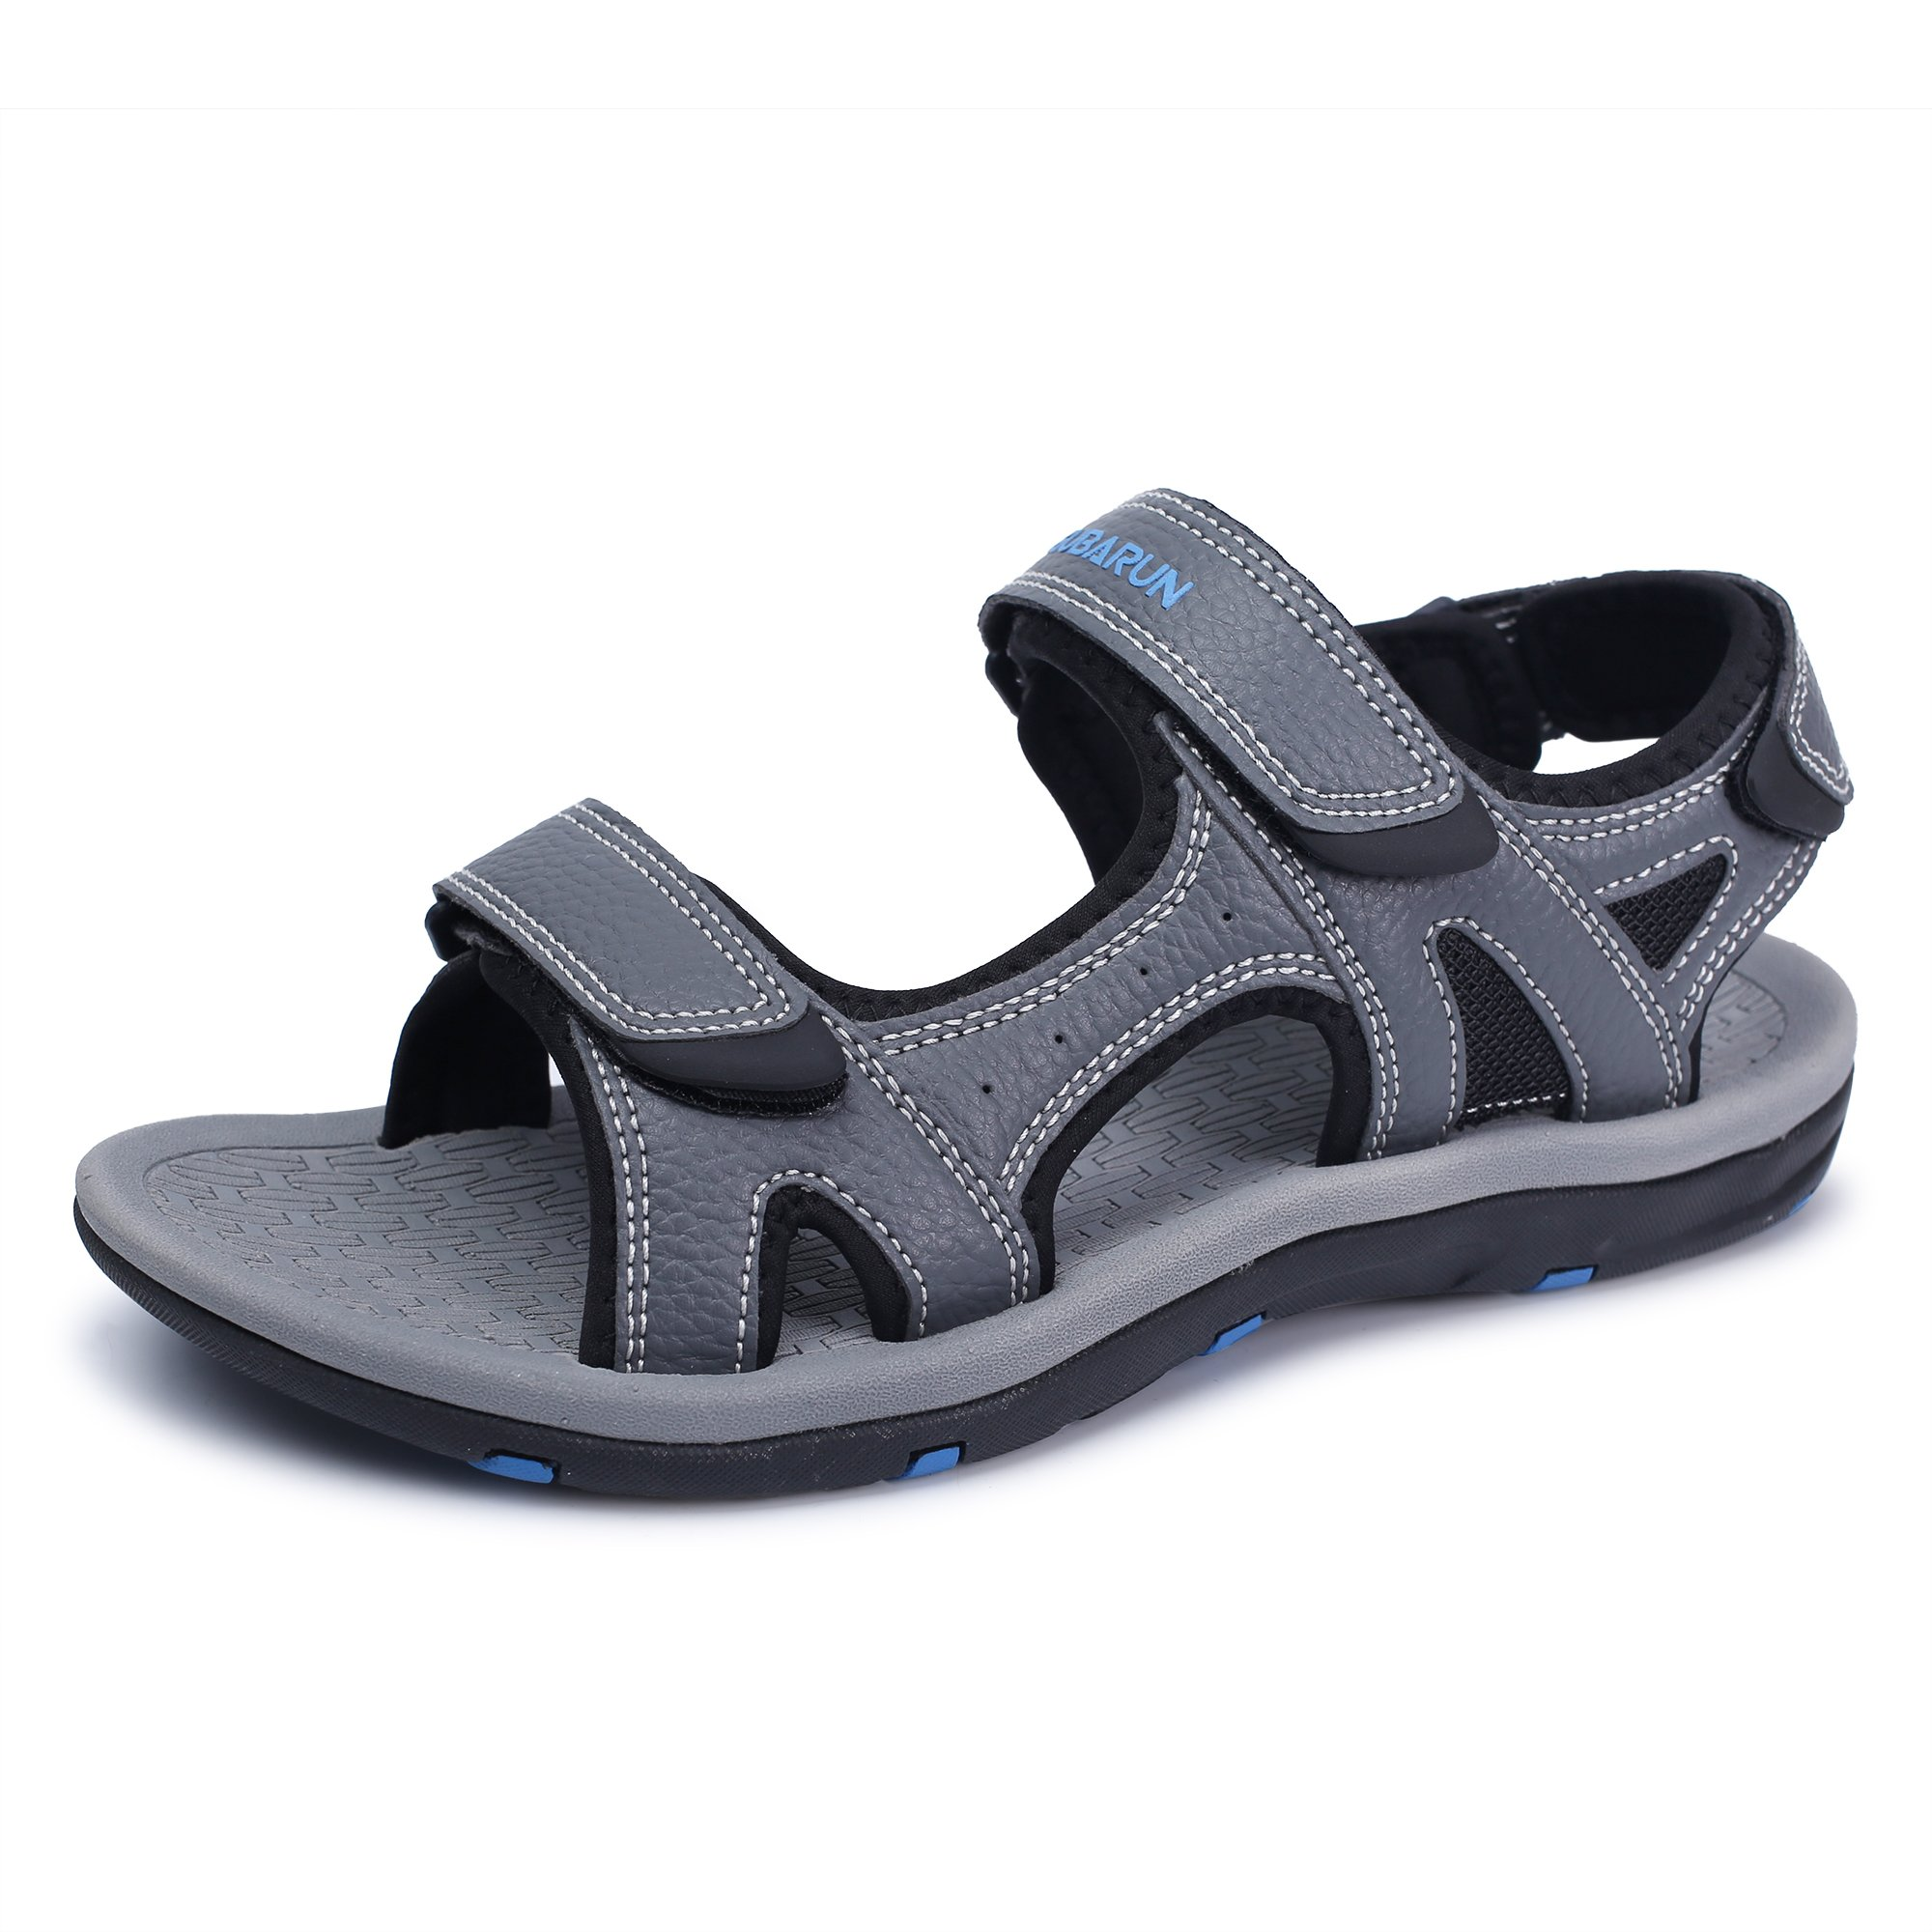 GUBARUN AthleticSandalsforMenOpen-ToeSandalsStrapSummerShoes(Gray 6.5)